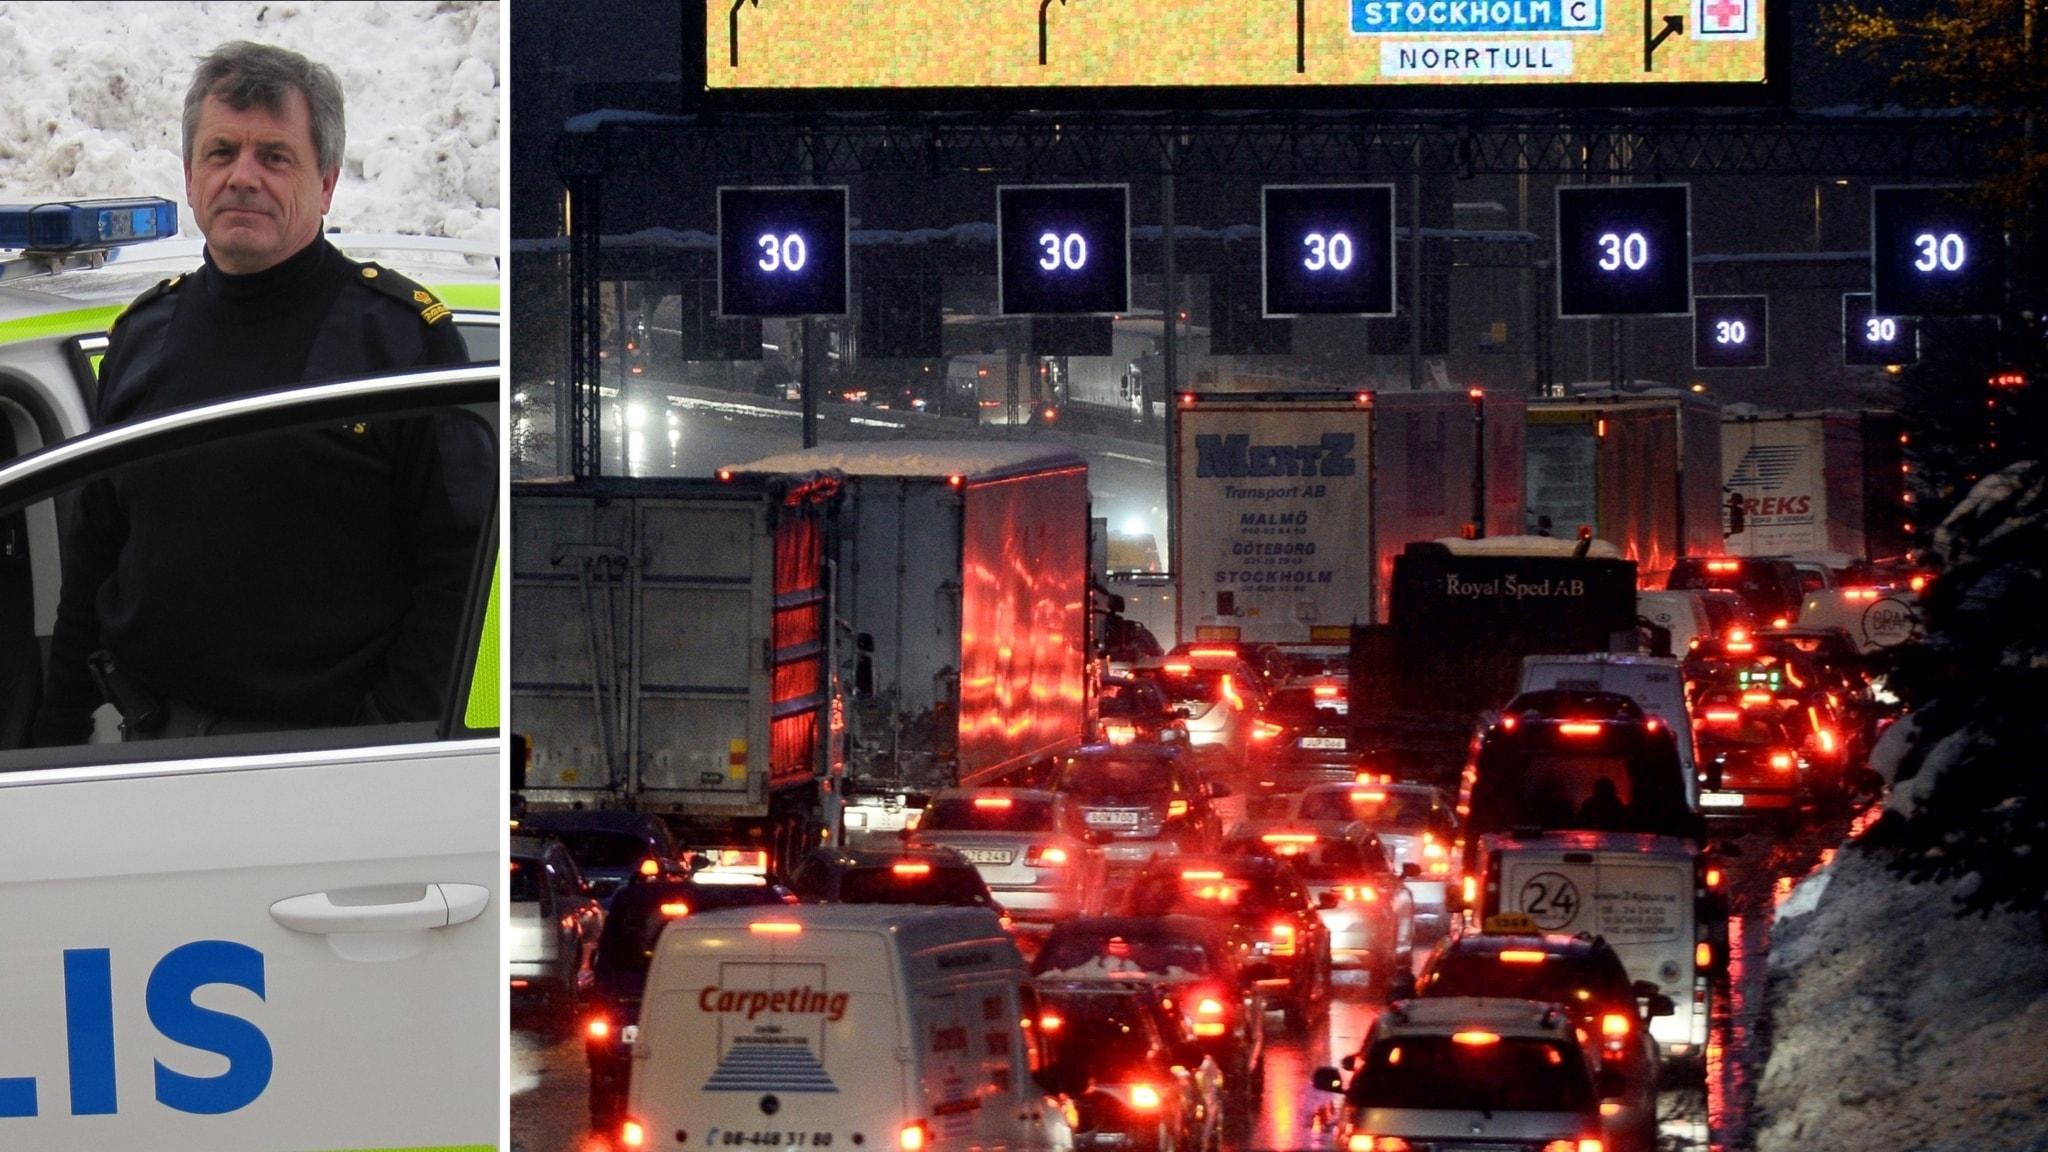 Trafikkaoset i stockholm fortsatter 1